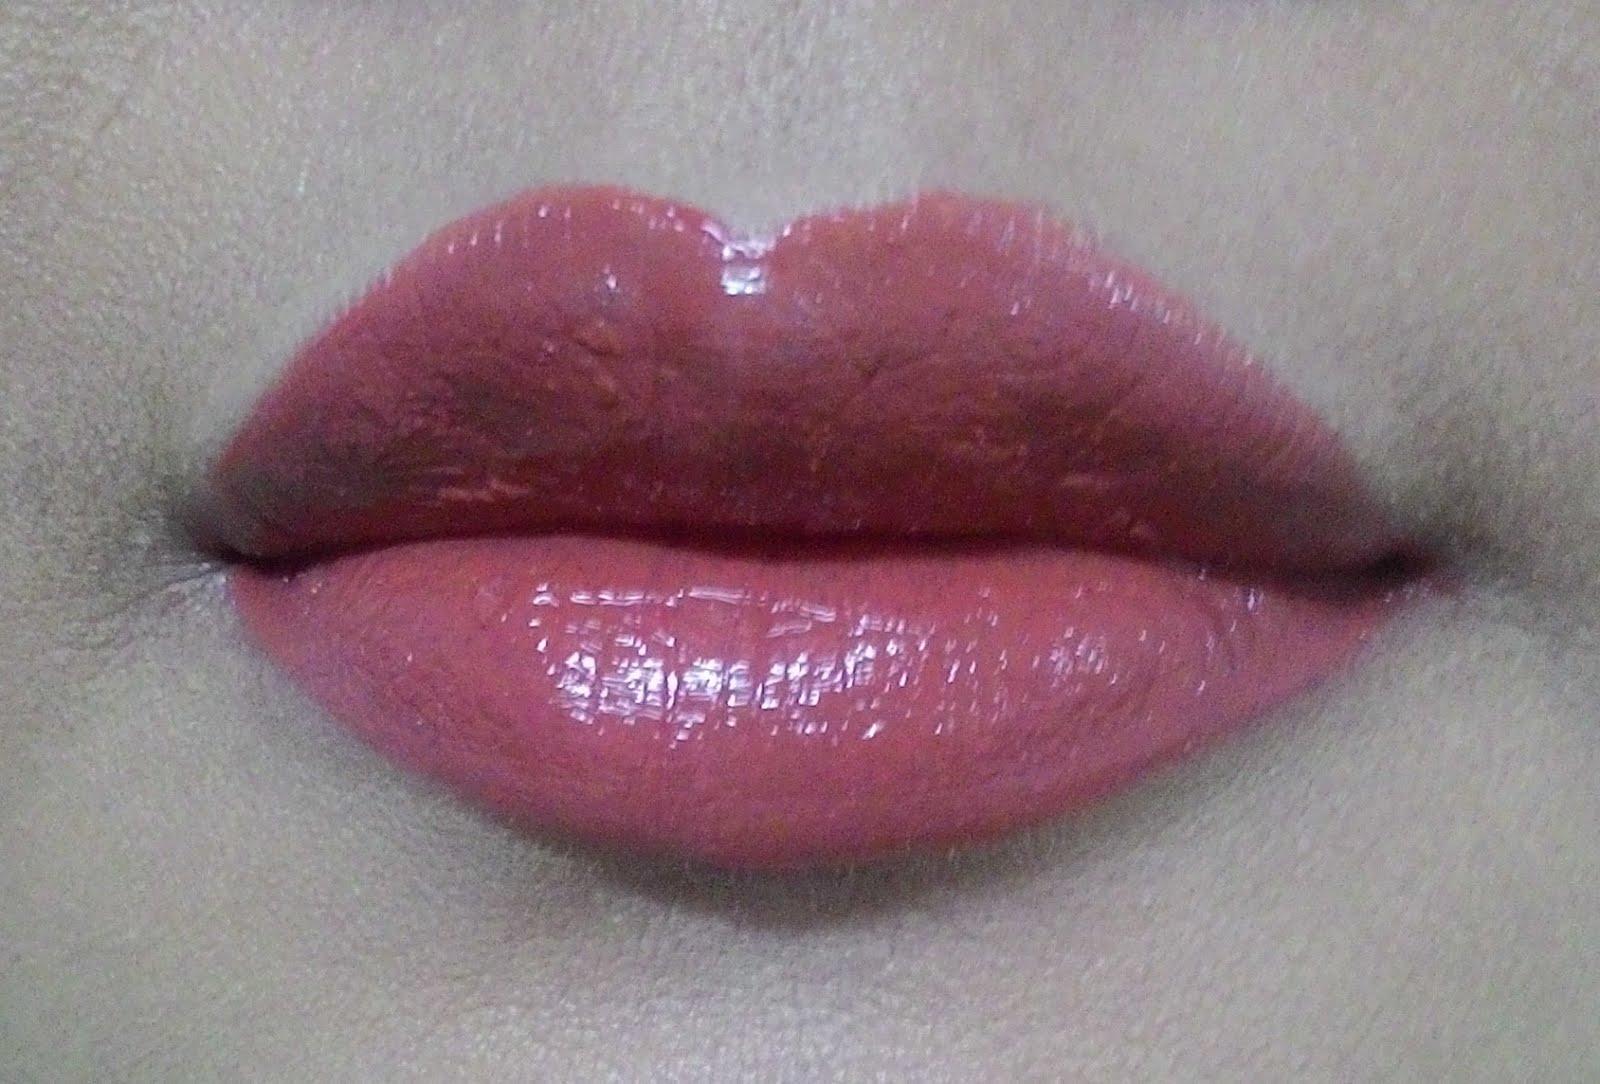 Sariayu Color Trend 2016 Duo Lip Krakatau 09 55 65 Gr E Senses Gloss Me 05 320475 Glossy